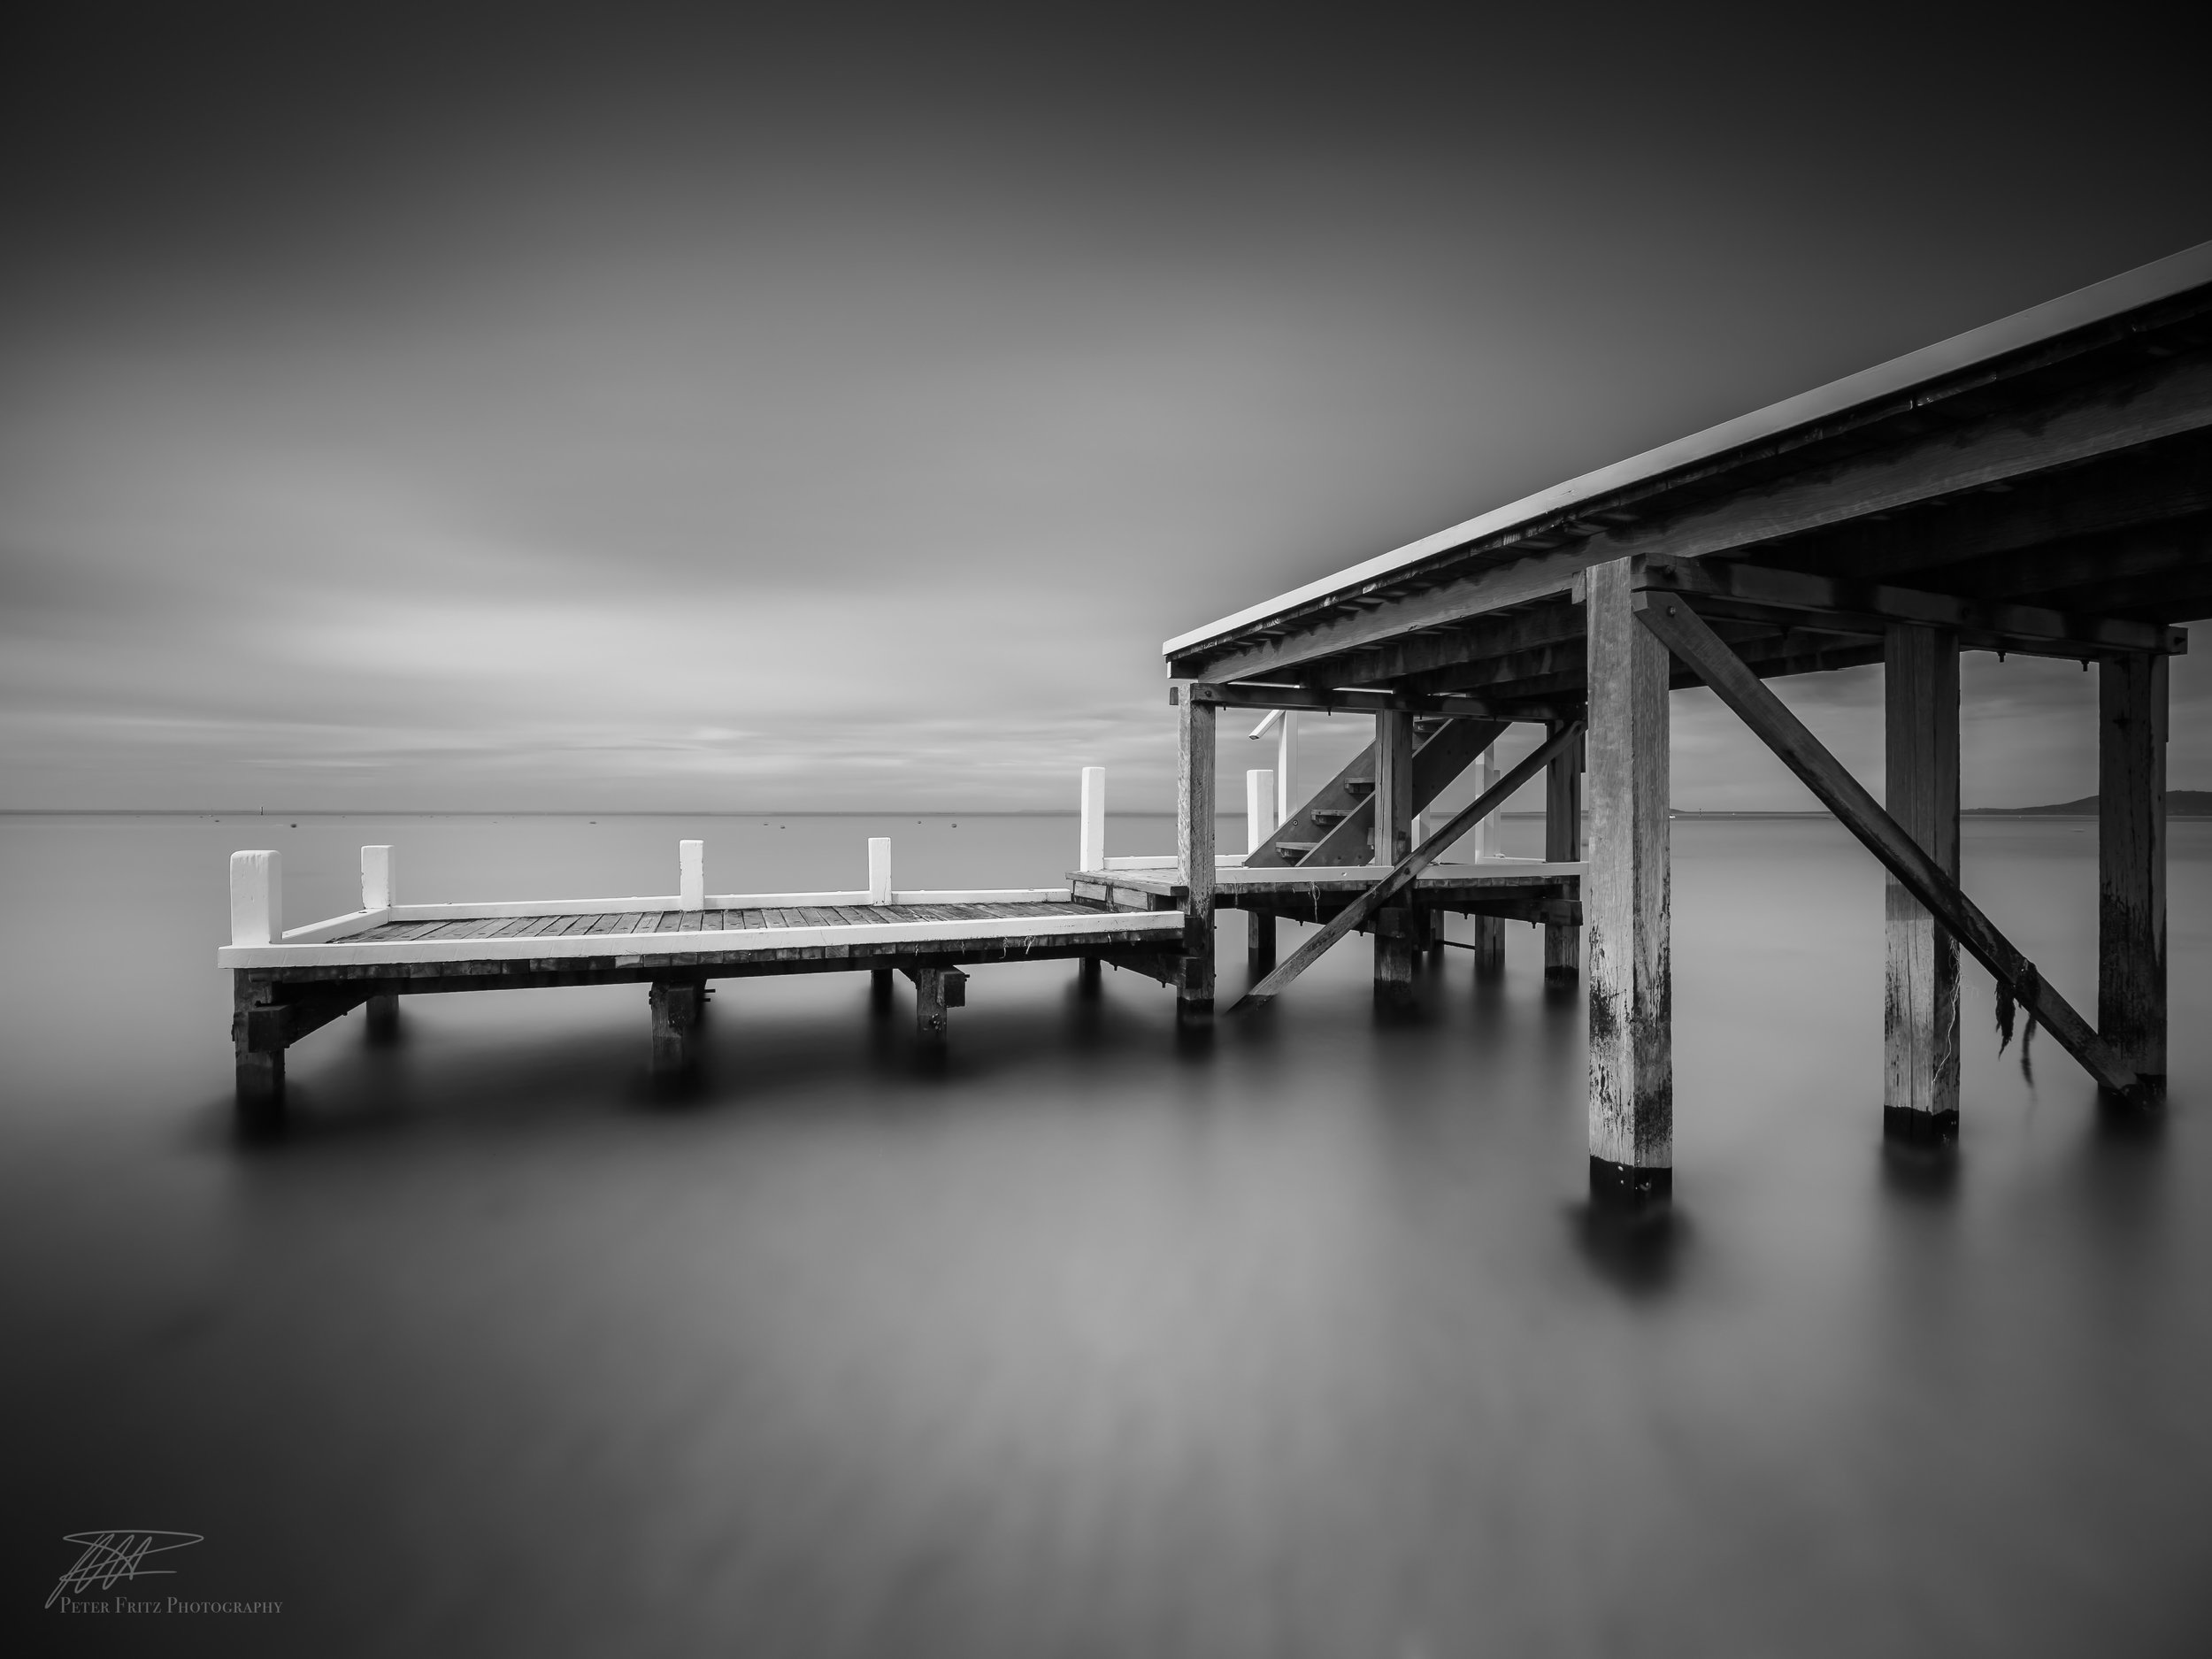 Swimming platform jetty 4x3.jpg